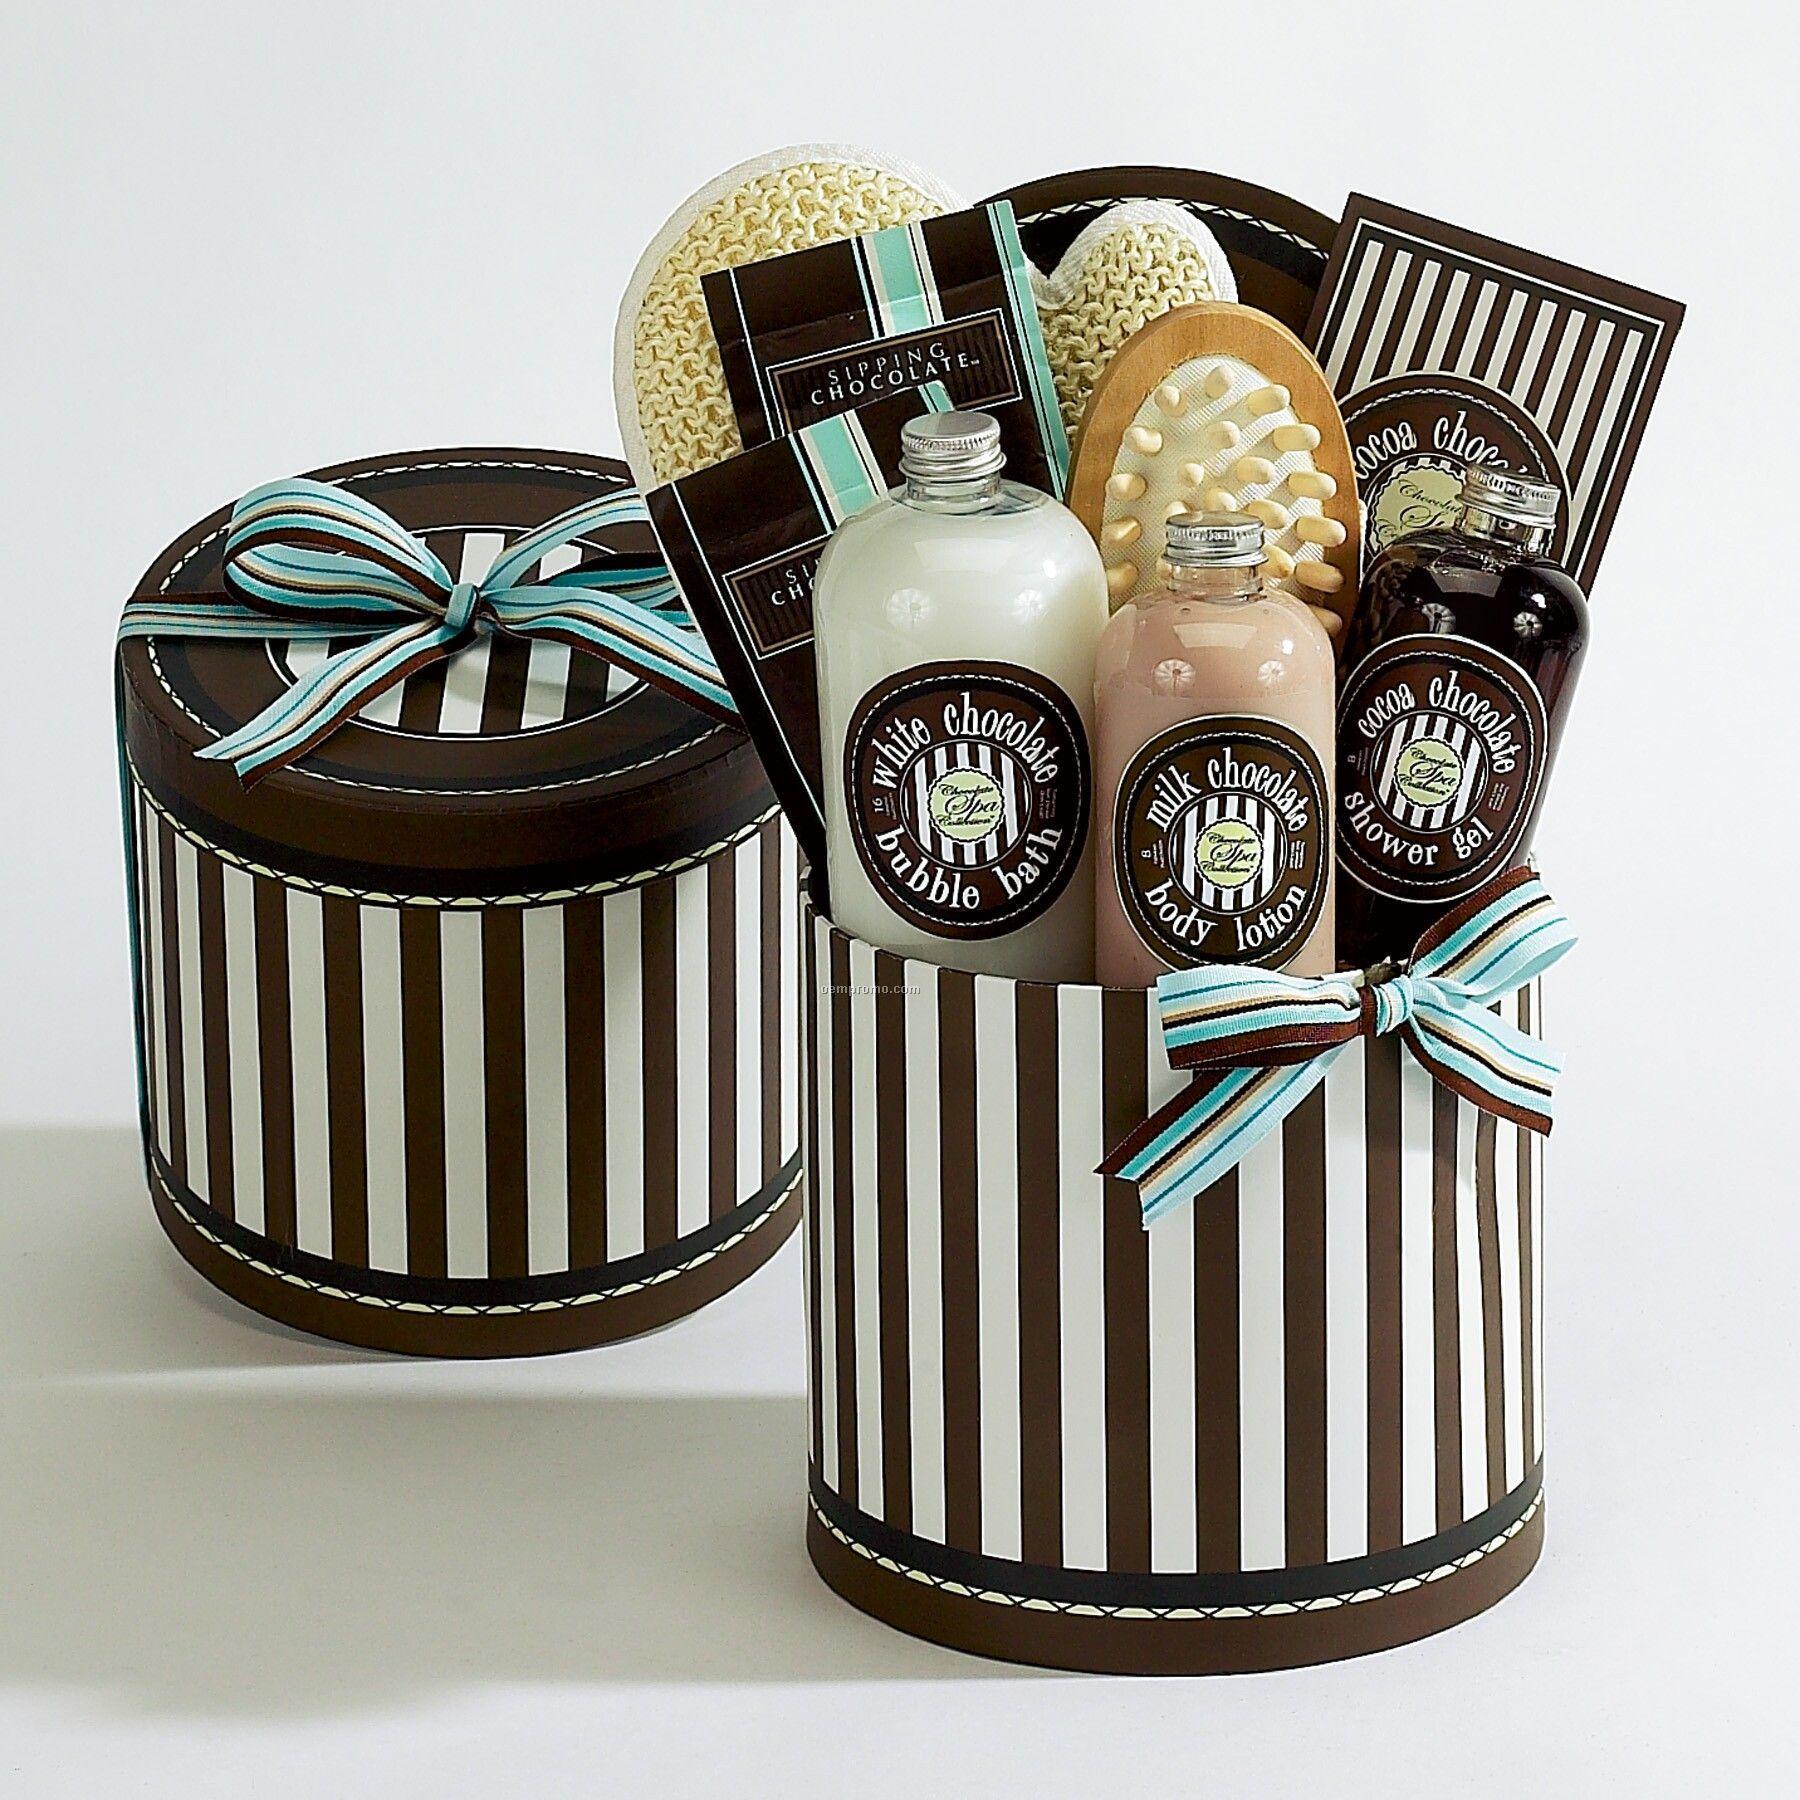 Chocolate Truffle Spa Indulgence Gift Box